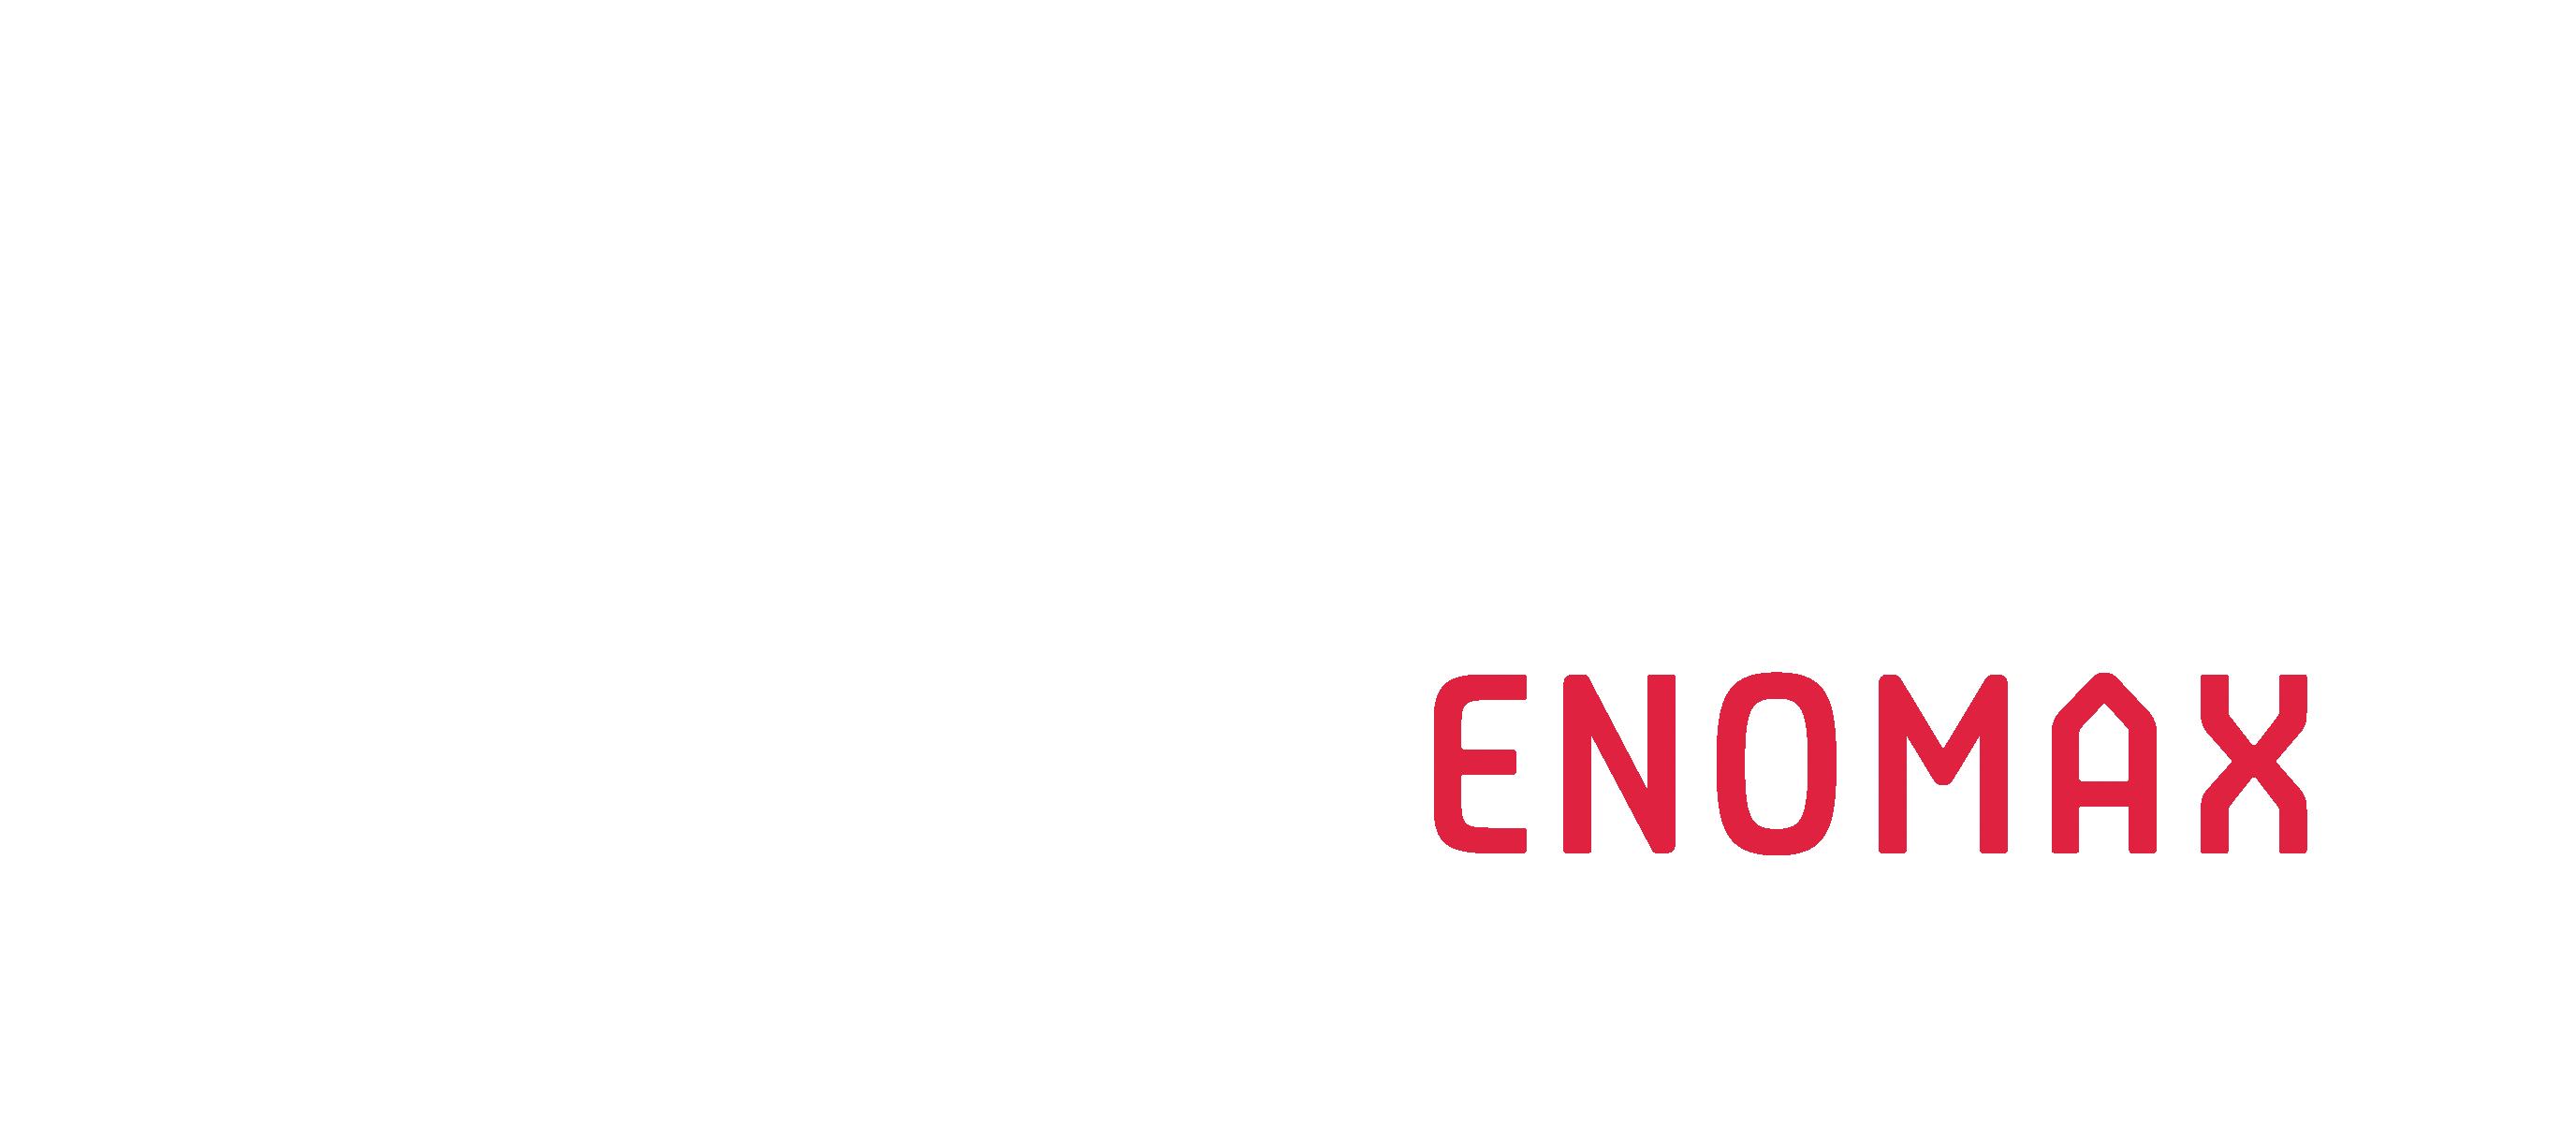 Supratec Enomax